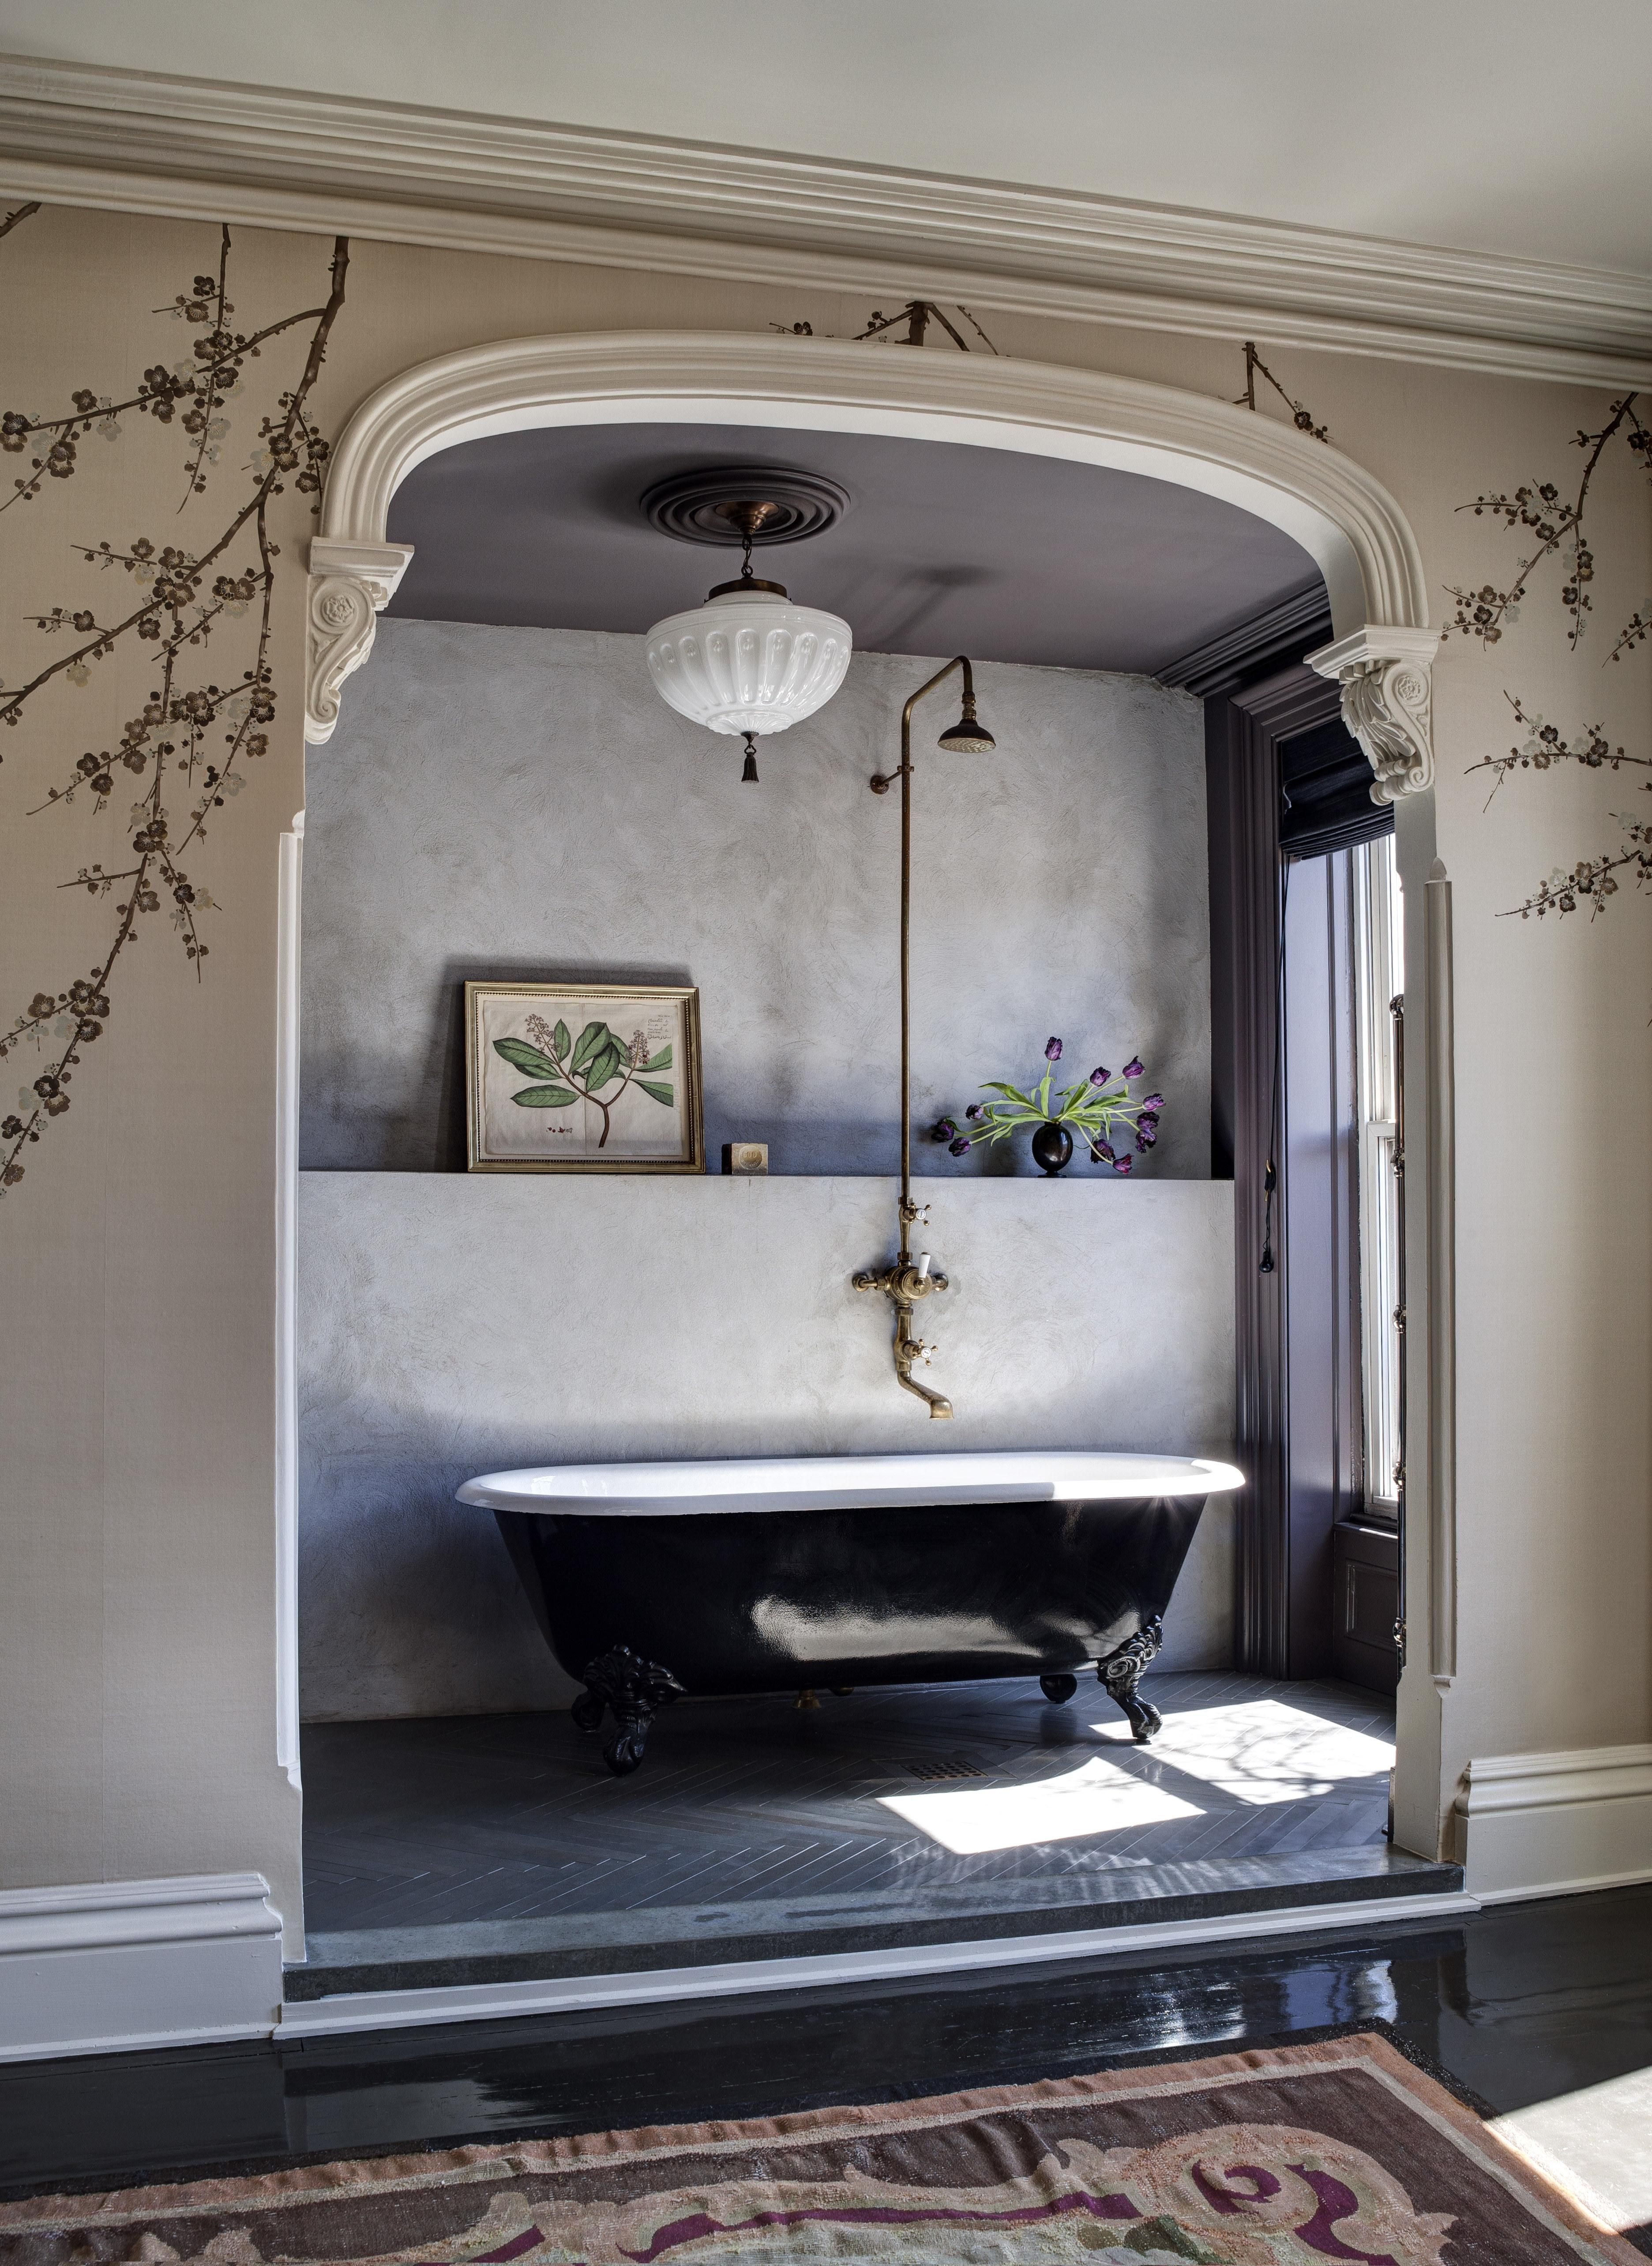 Badezimmer dekor rund um die wanne  interiors by roman and williams buildings and interiors  design